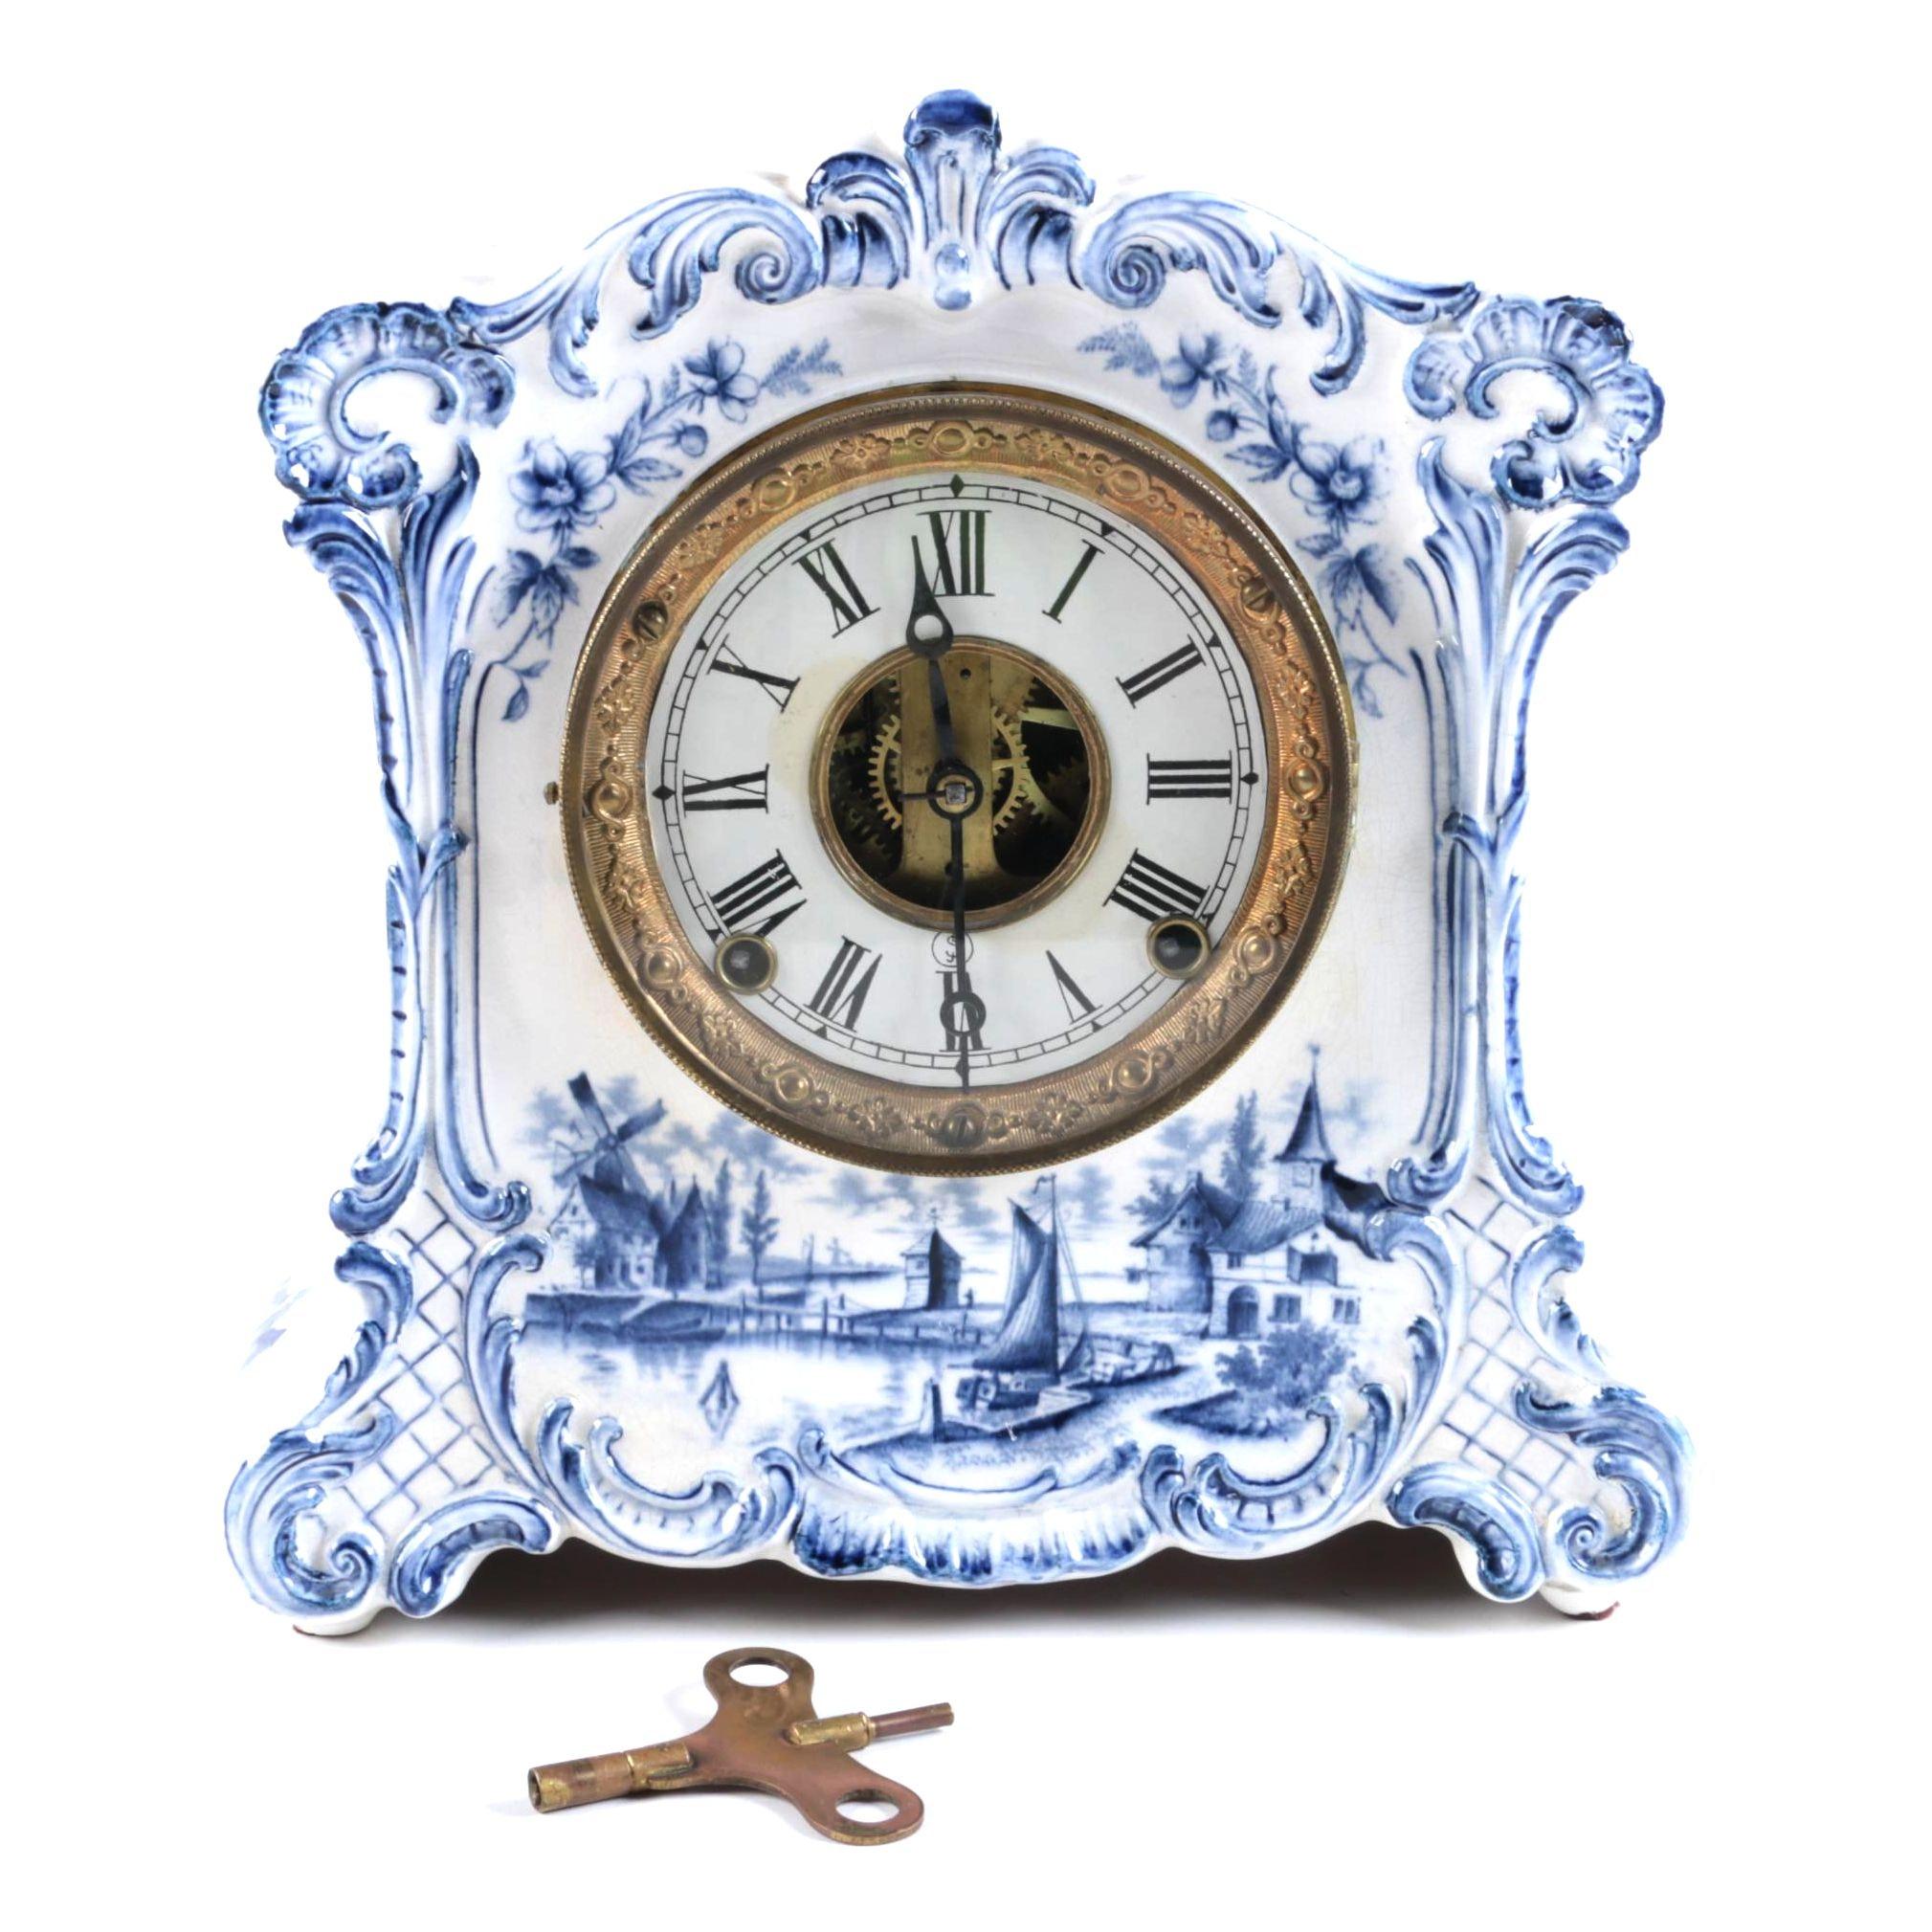 19th-Century Delft Mantel Clock with F. Kroeber Clock Co. Works